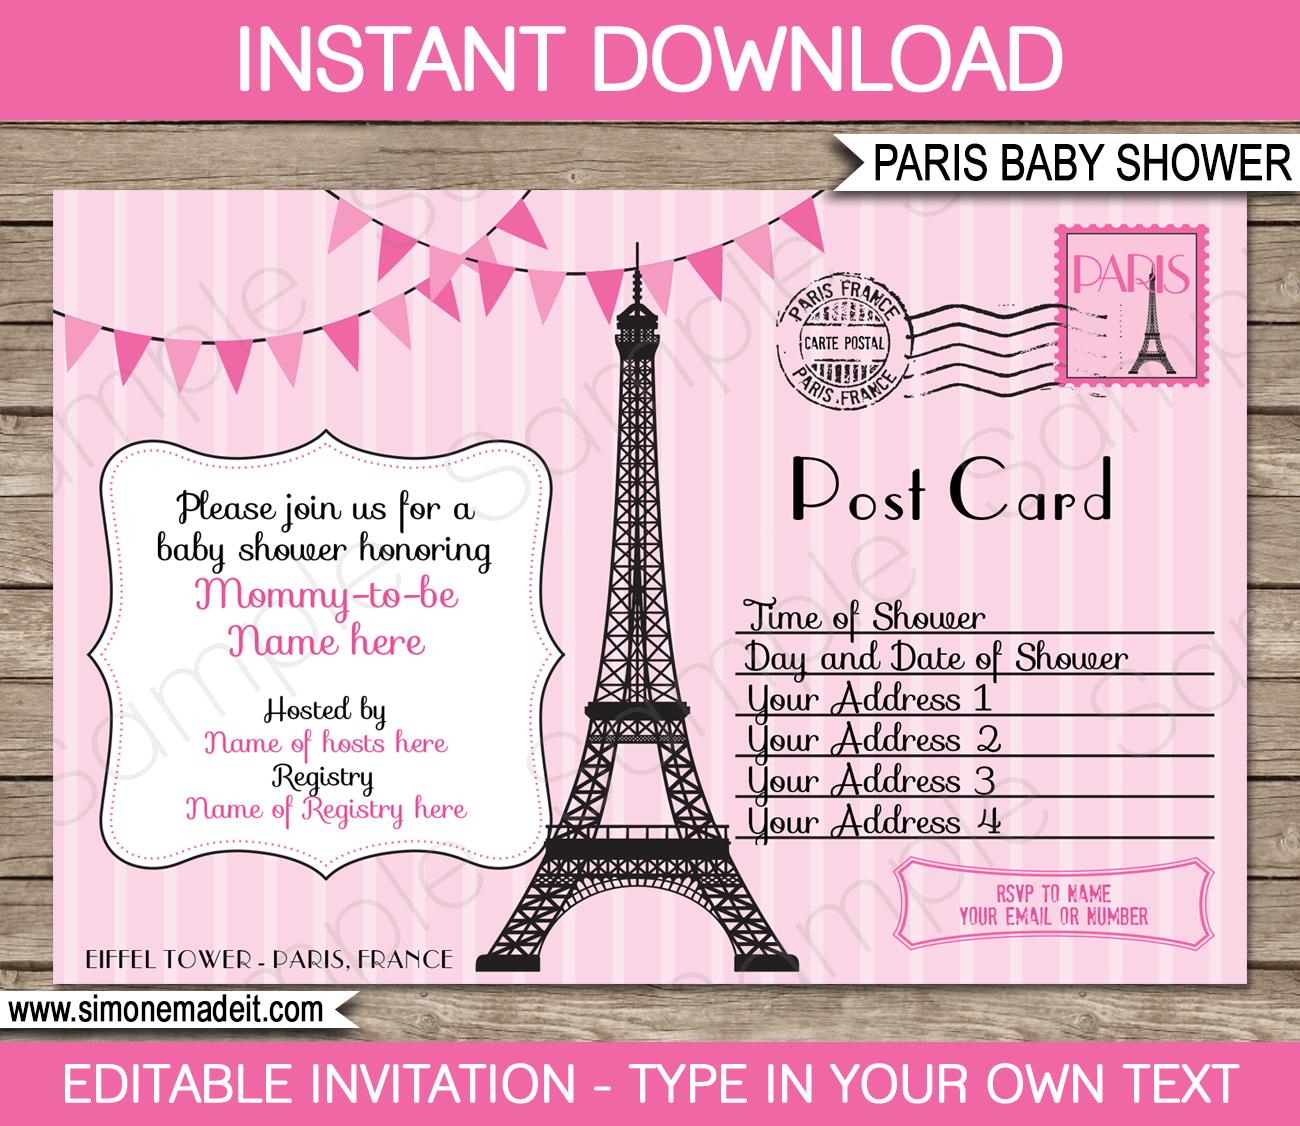 Paris Baby Shower Invitations